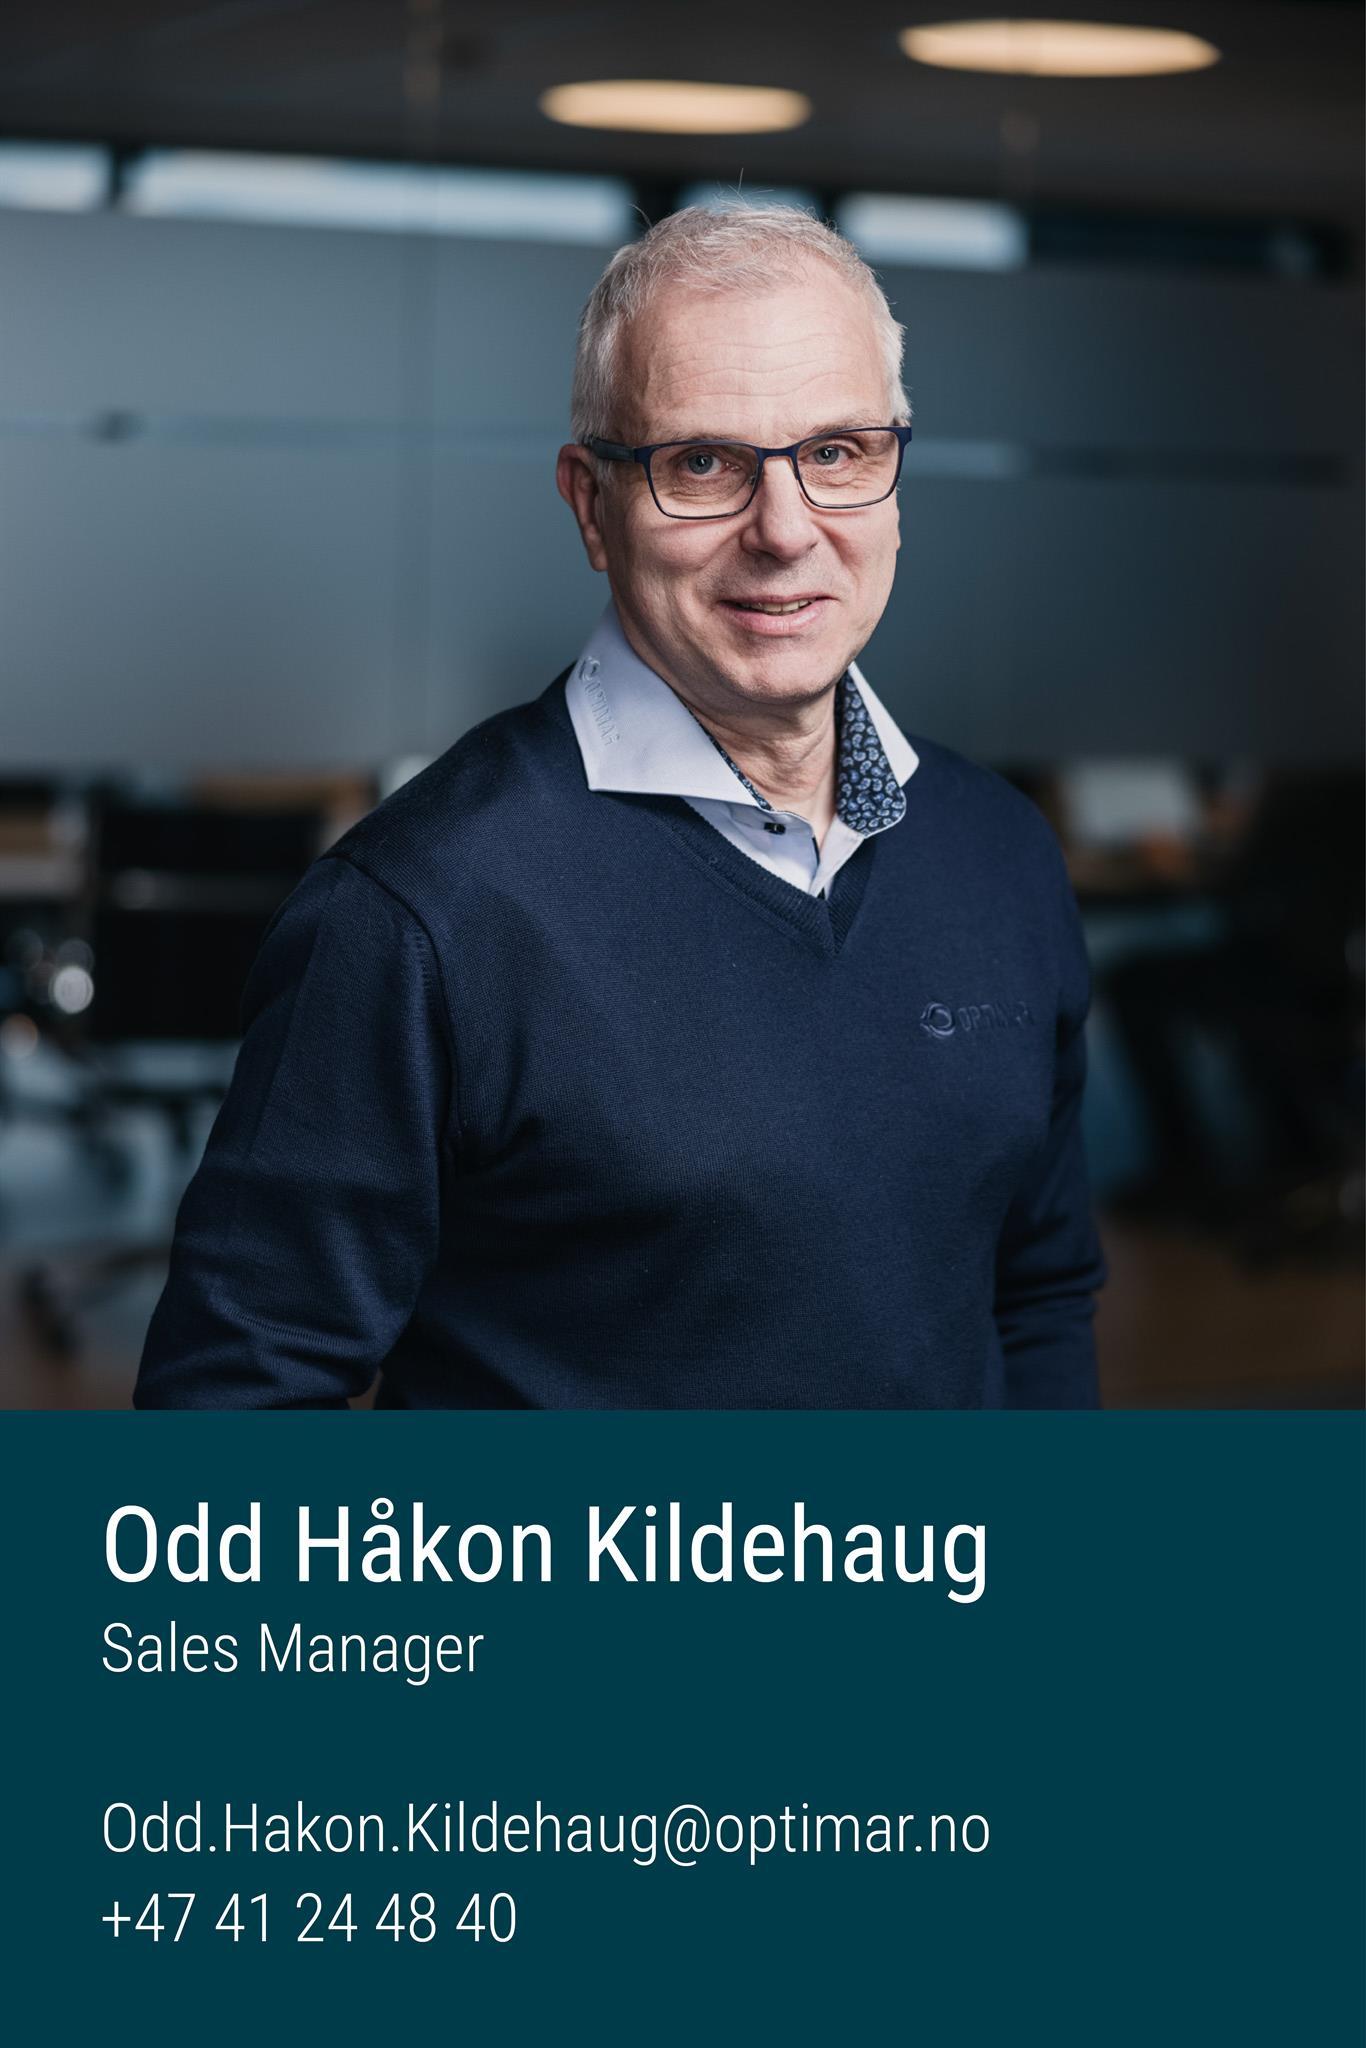 Odd Håkon Kildehaug